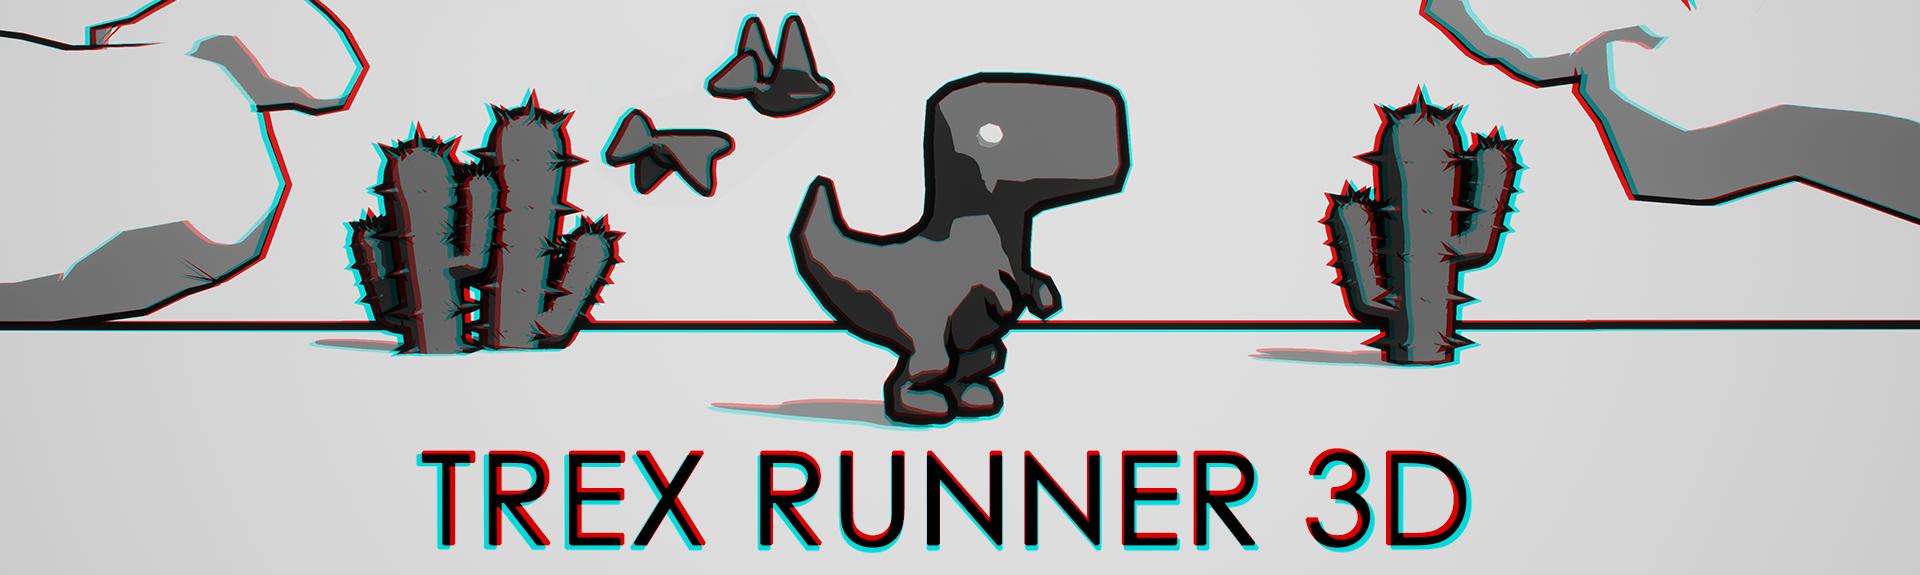 Trex Runner 3D